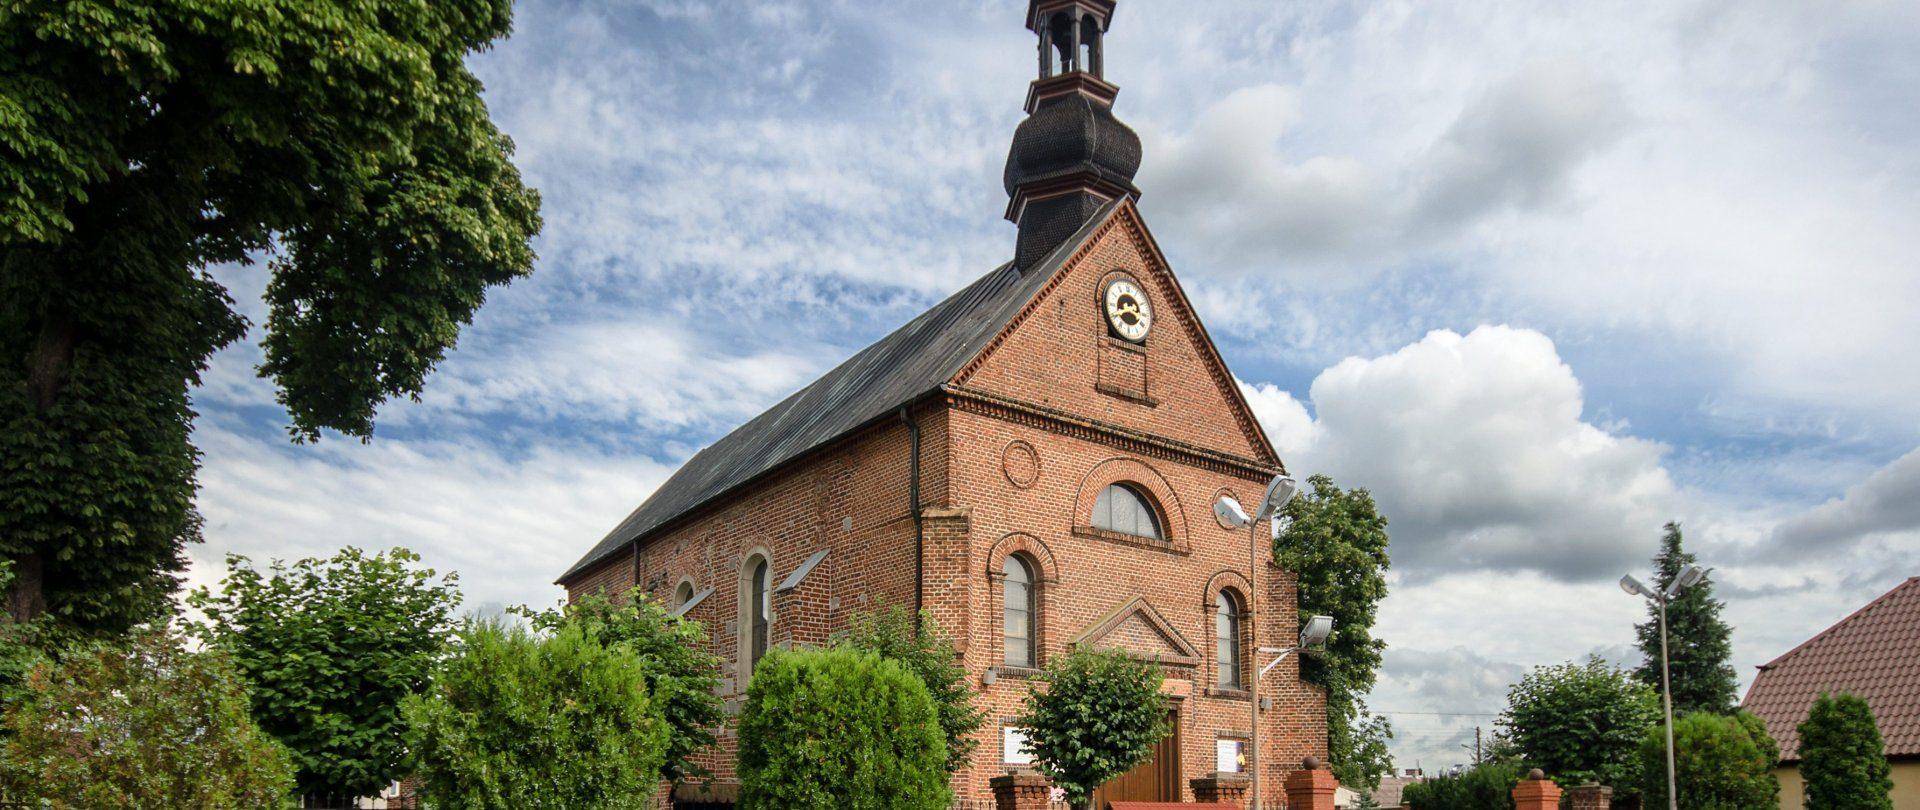 Churches of Kazimierz Biskupi